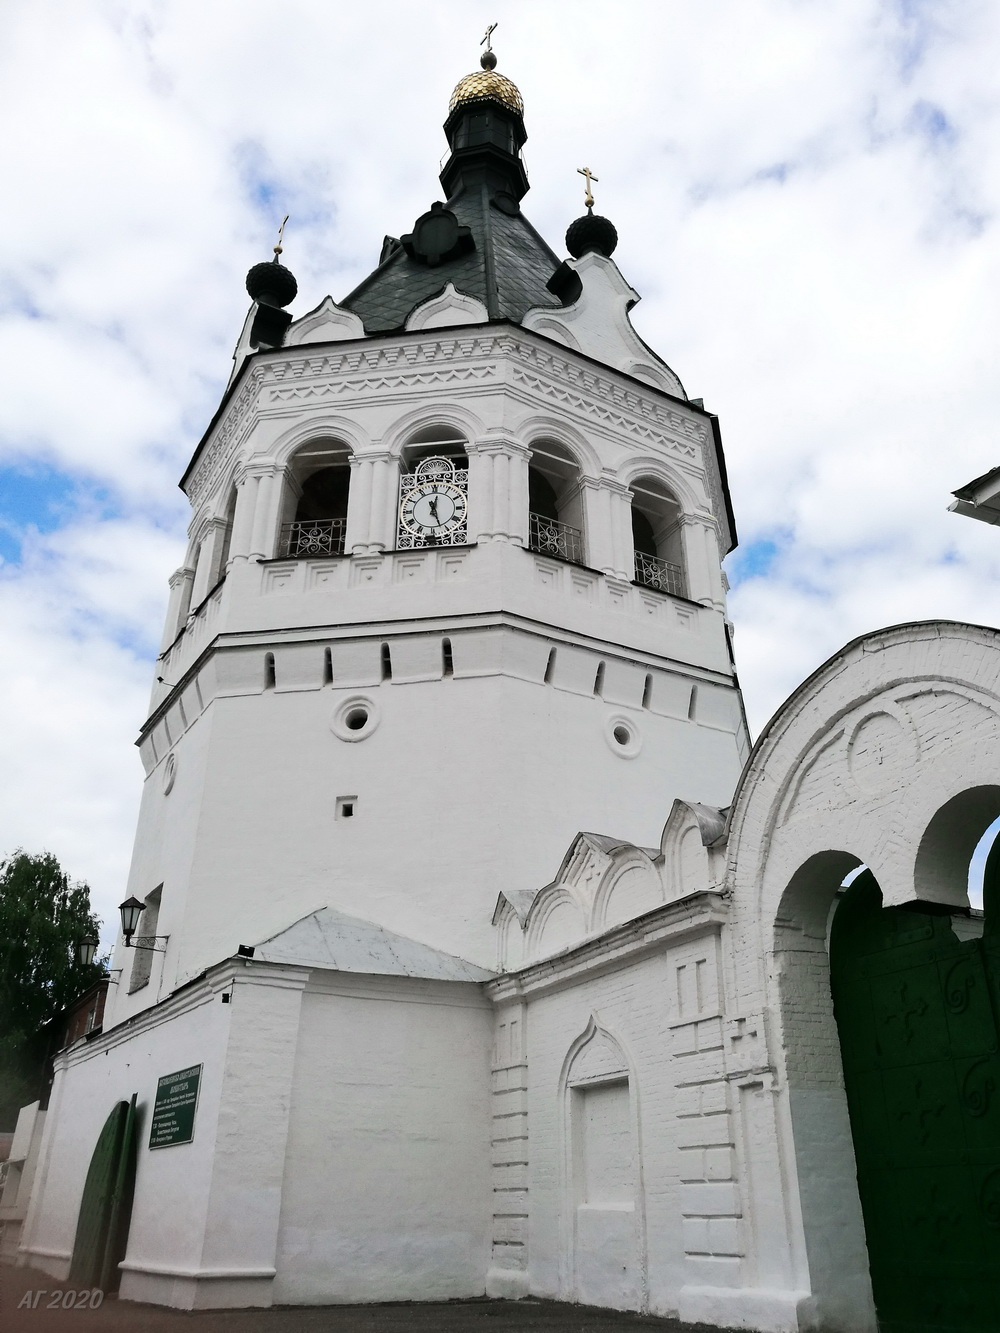 Богоявленско-Анастасиин женский монастырь, Кострома, 02.08.2020